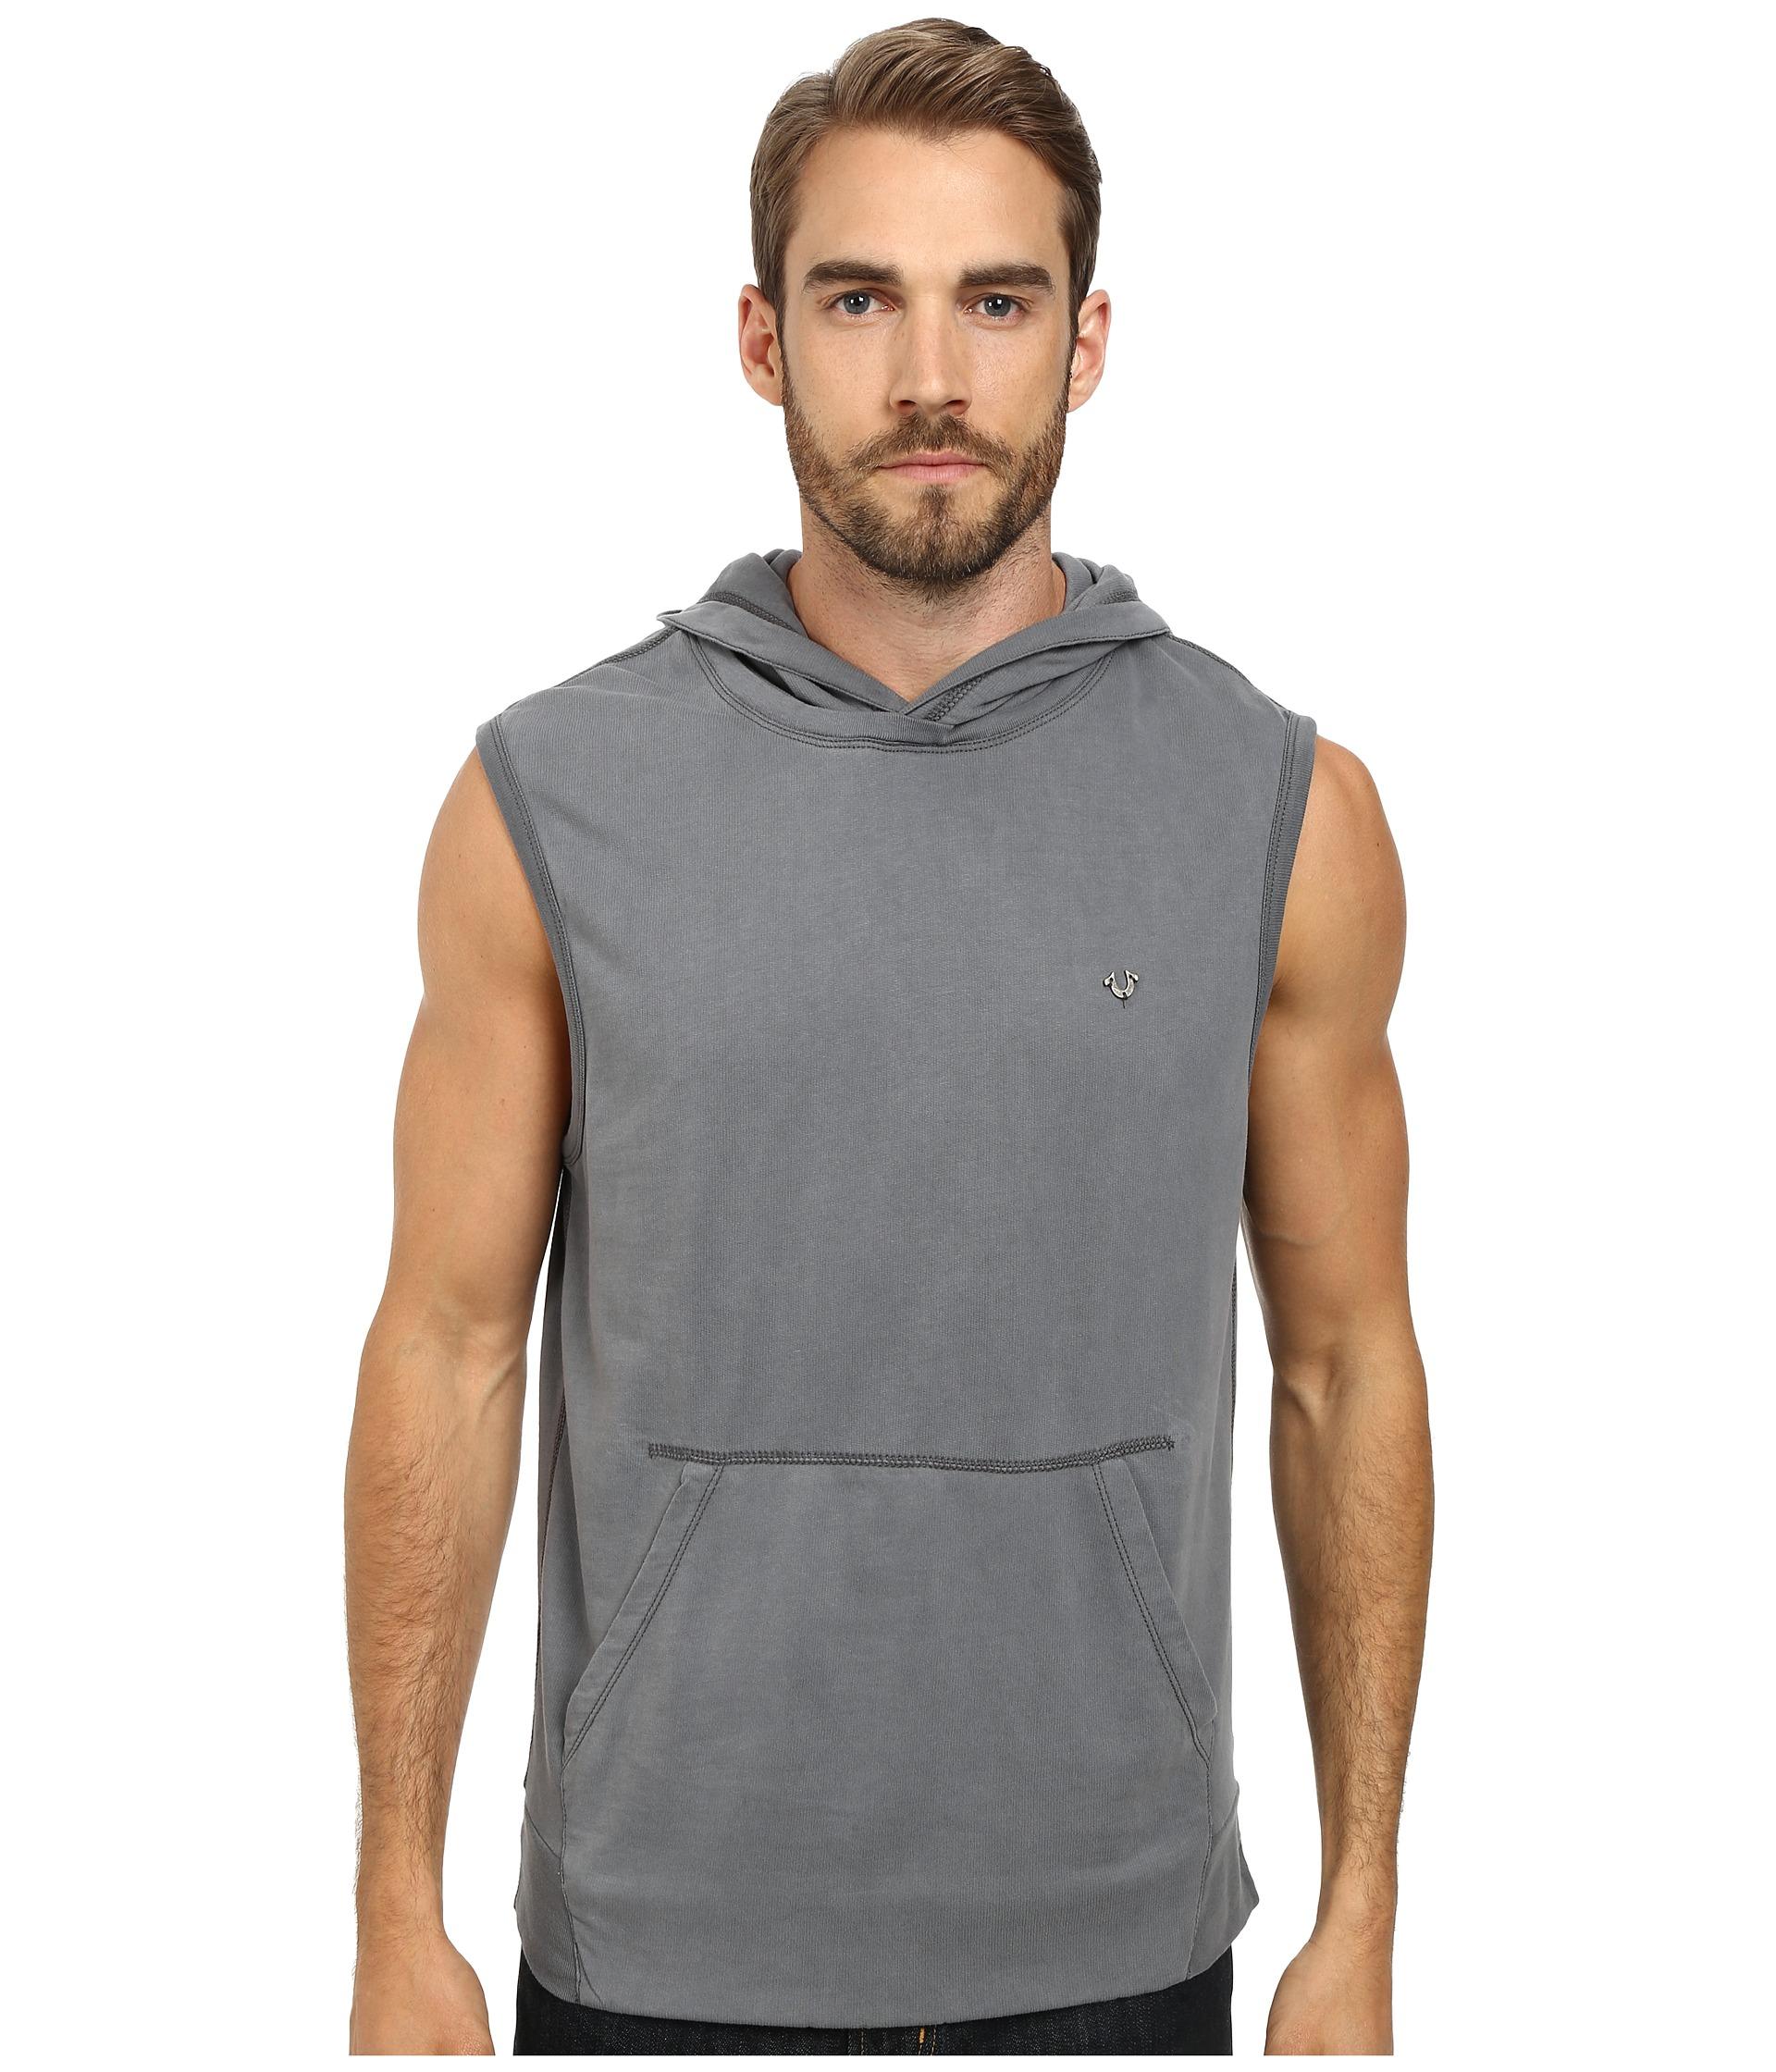 Sleeveless Hoodie - Trendy Clothes